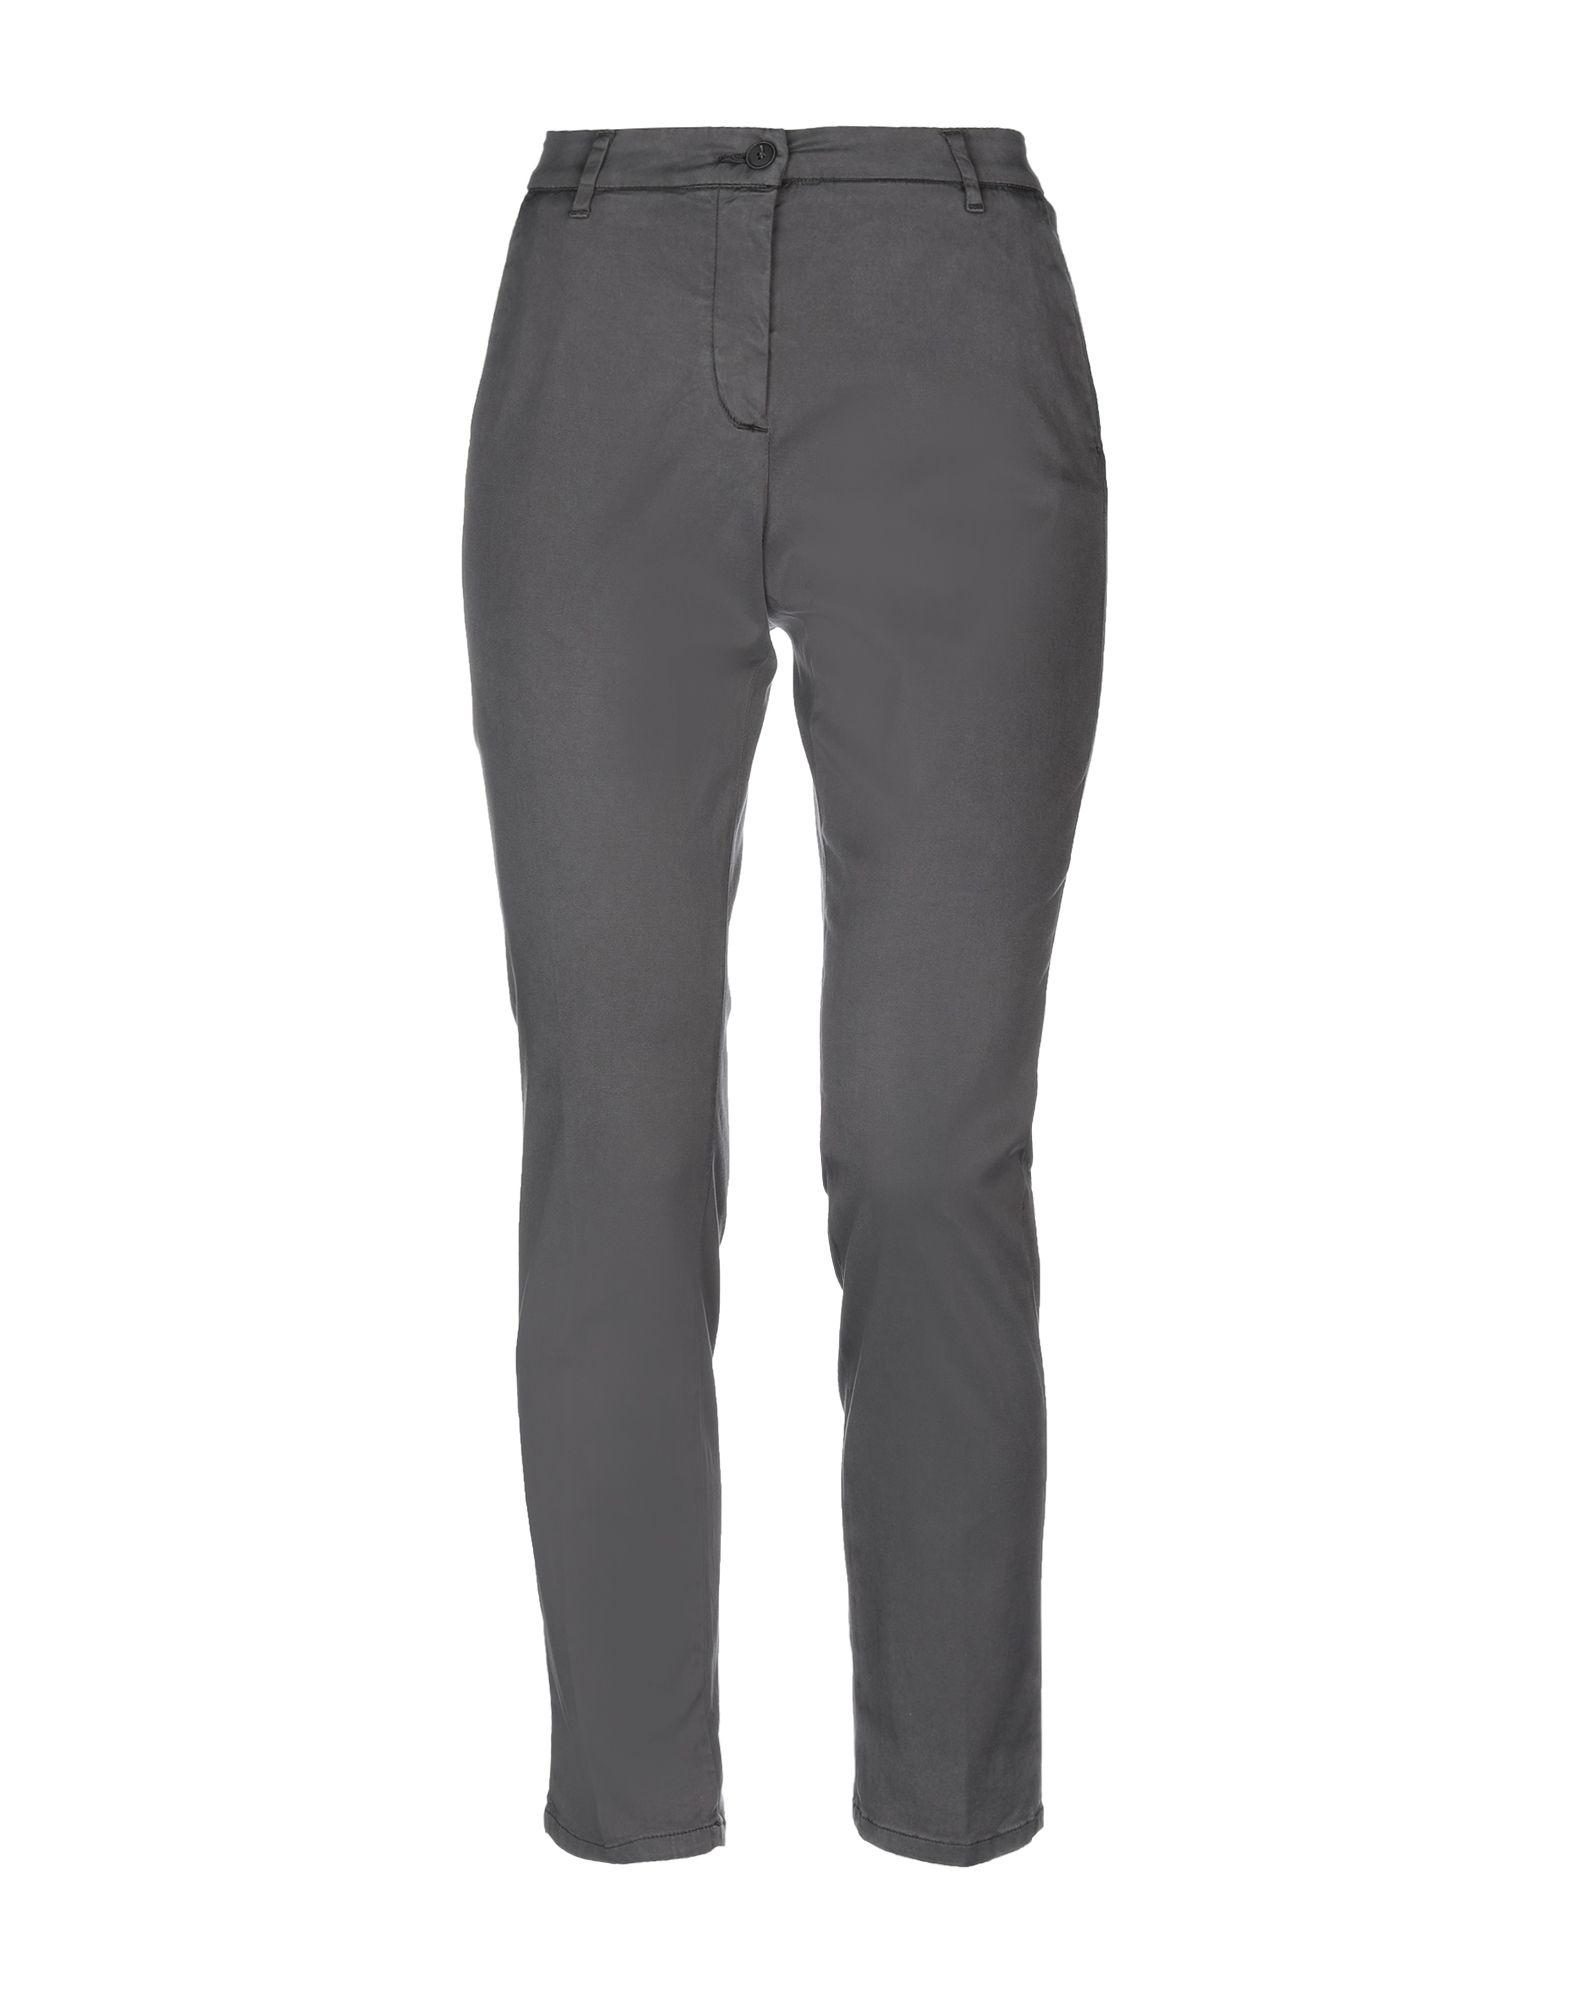 Pantalone Four Friends Friends donna - 13241712RI  bester Verkauf